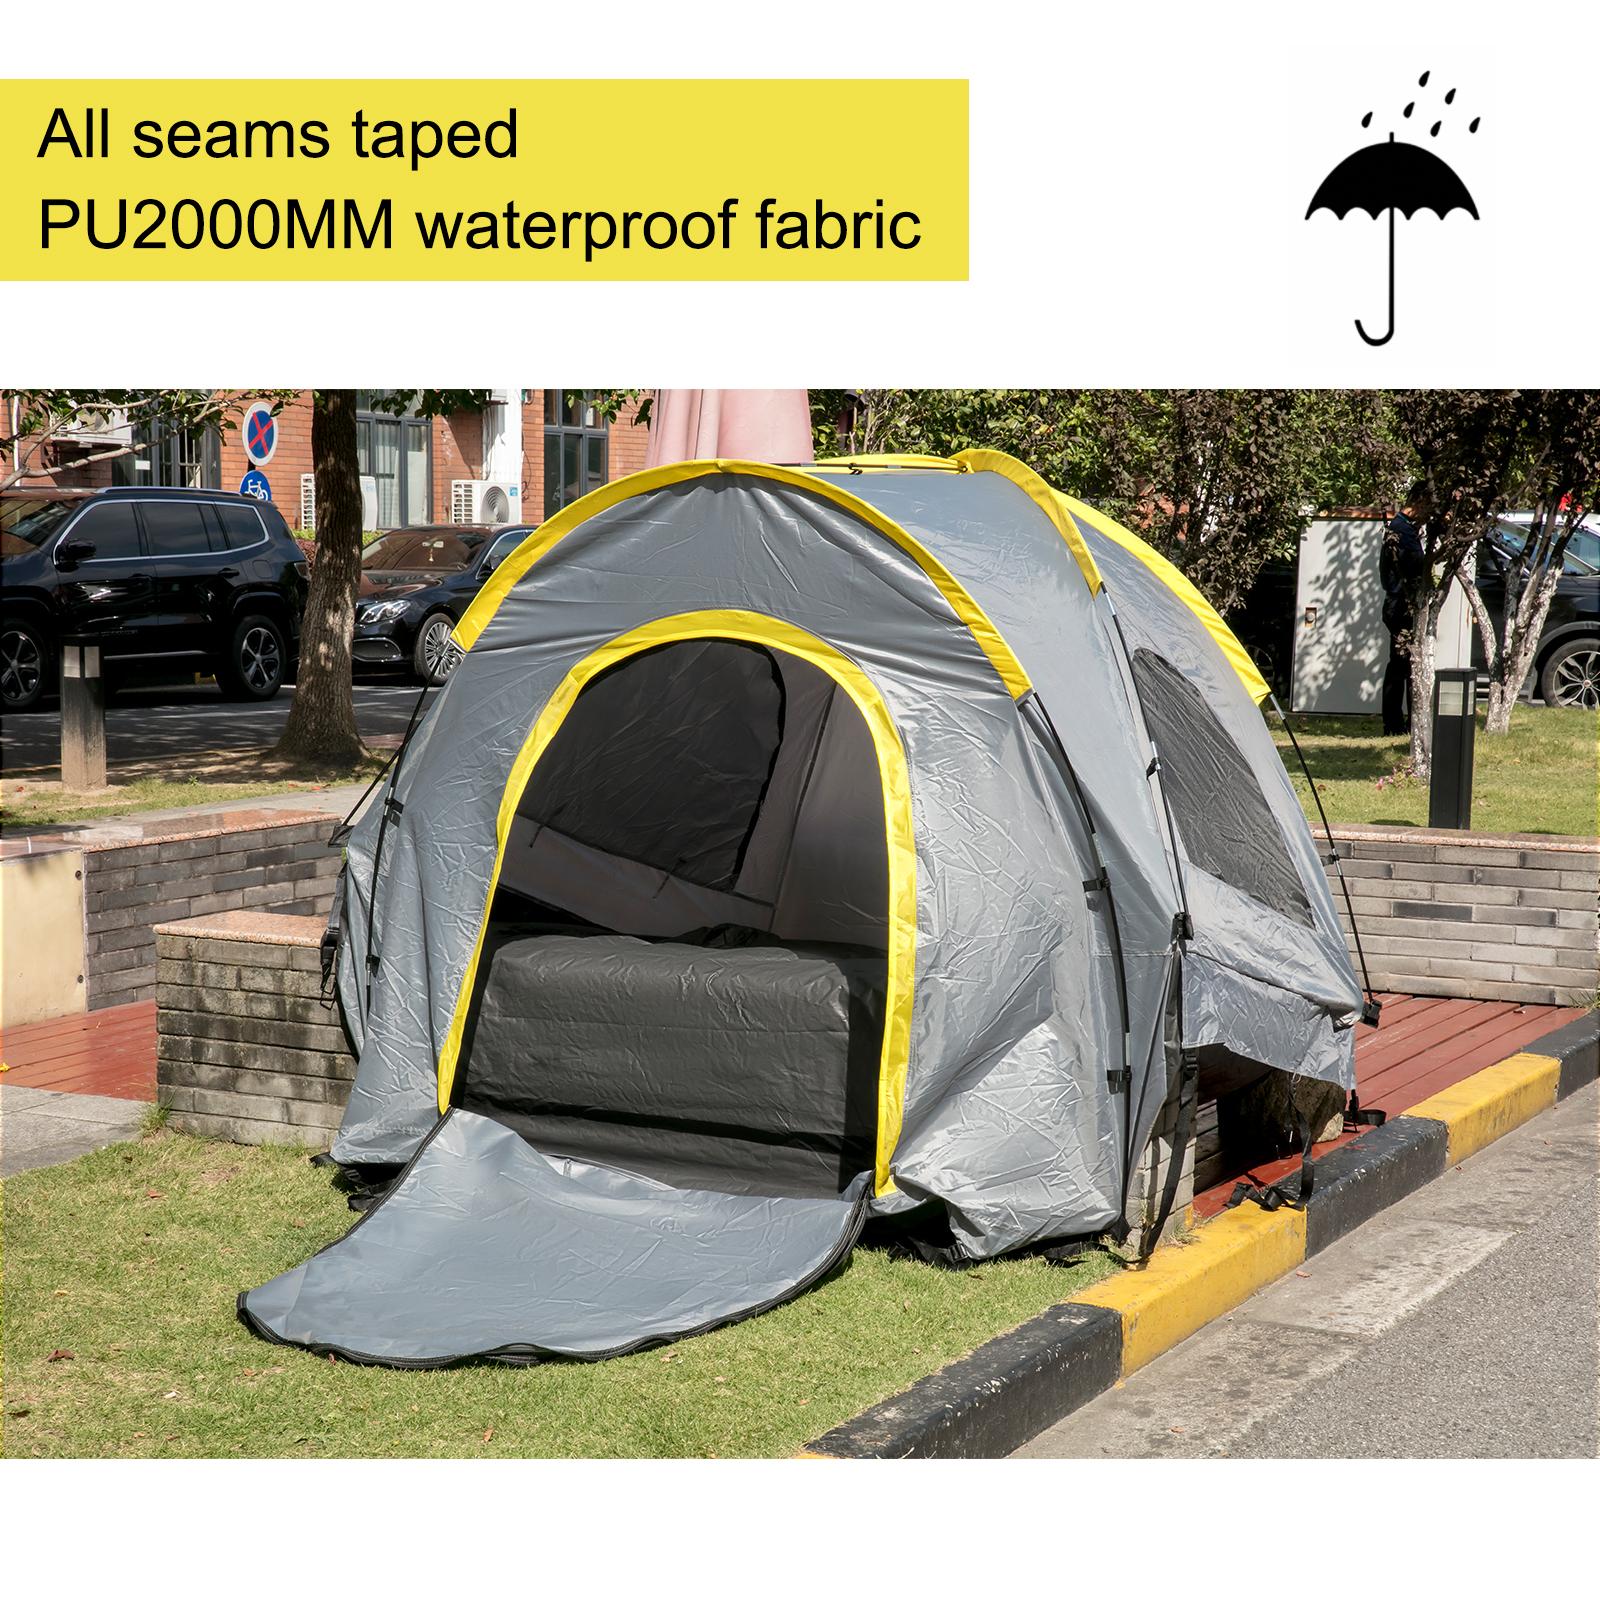 thumbnail 8 - VEVOR Truck Tent Truck Bed Tent 5' - 8' Pickup Tent Waterproof Outdoor Camping